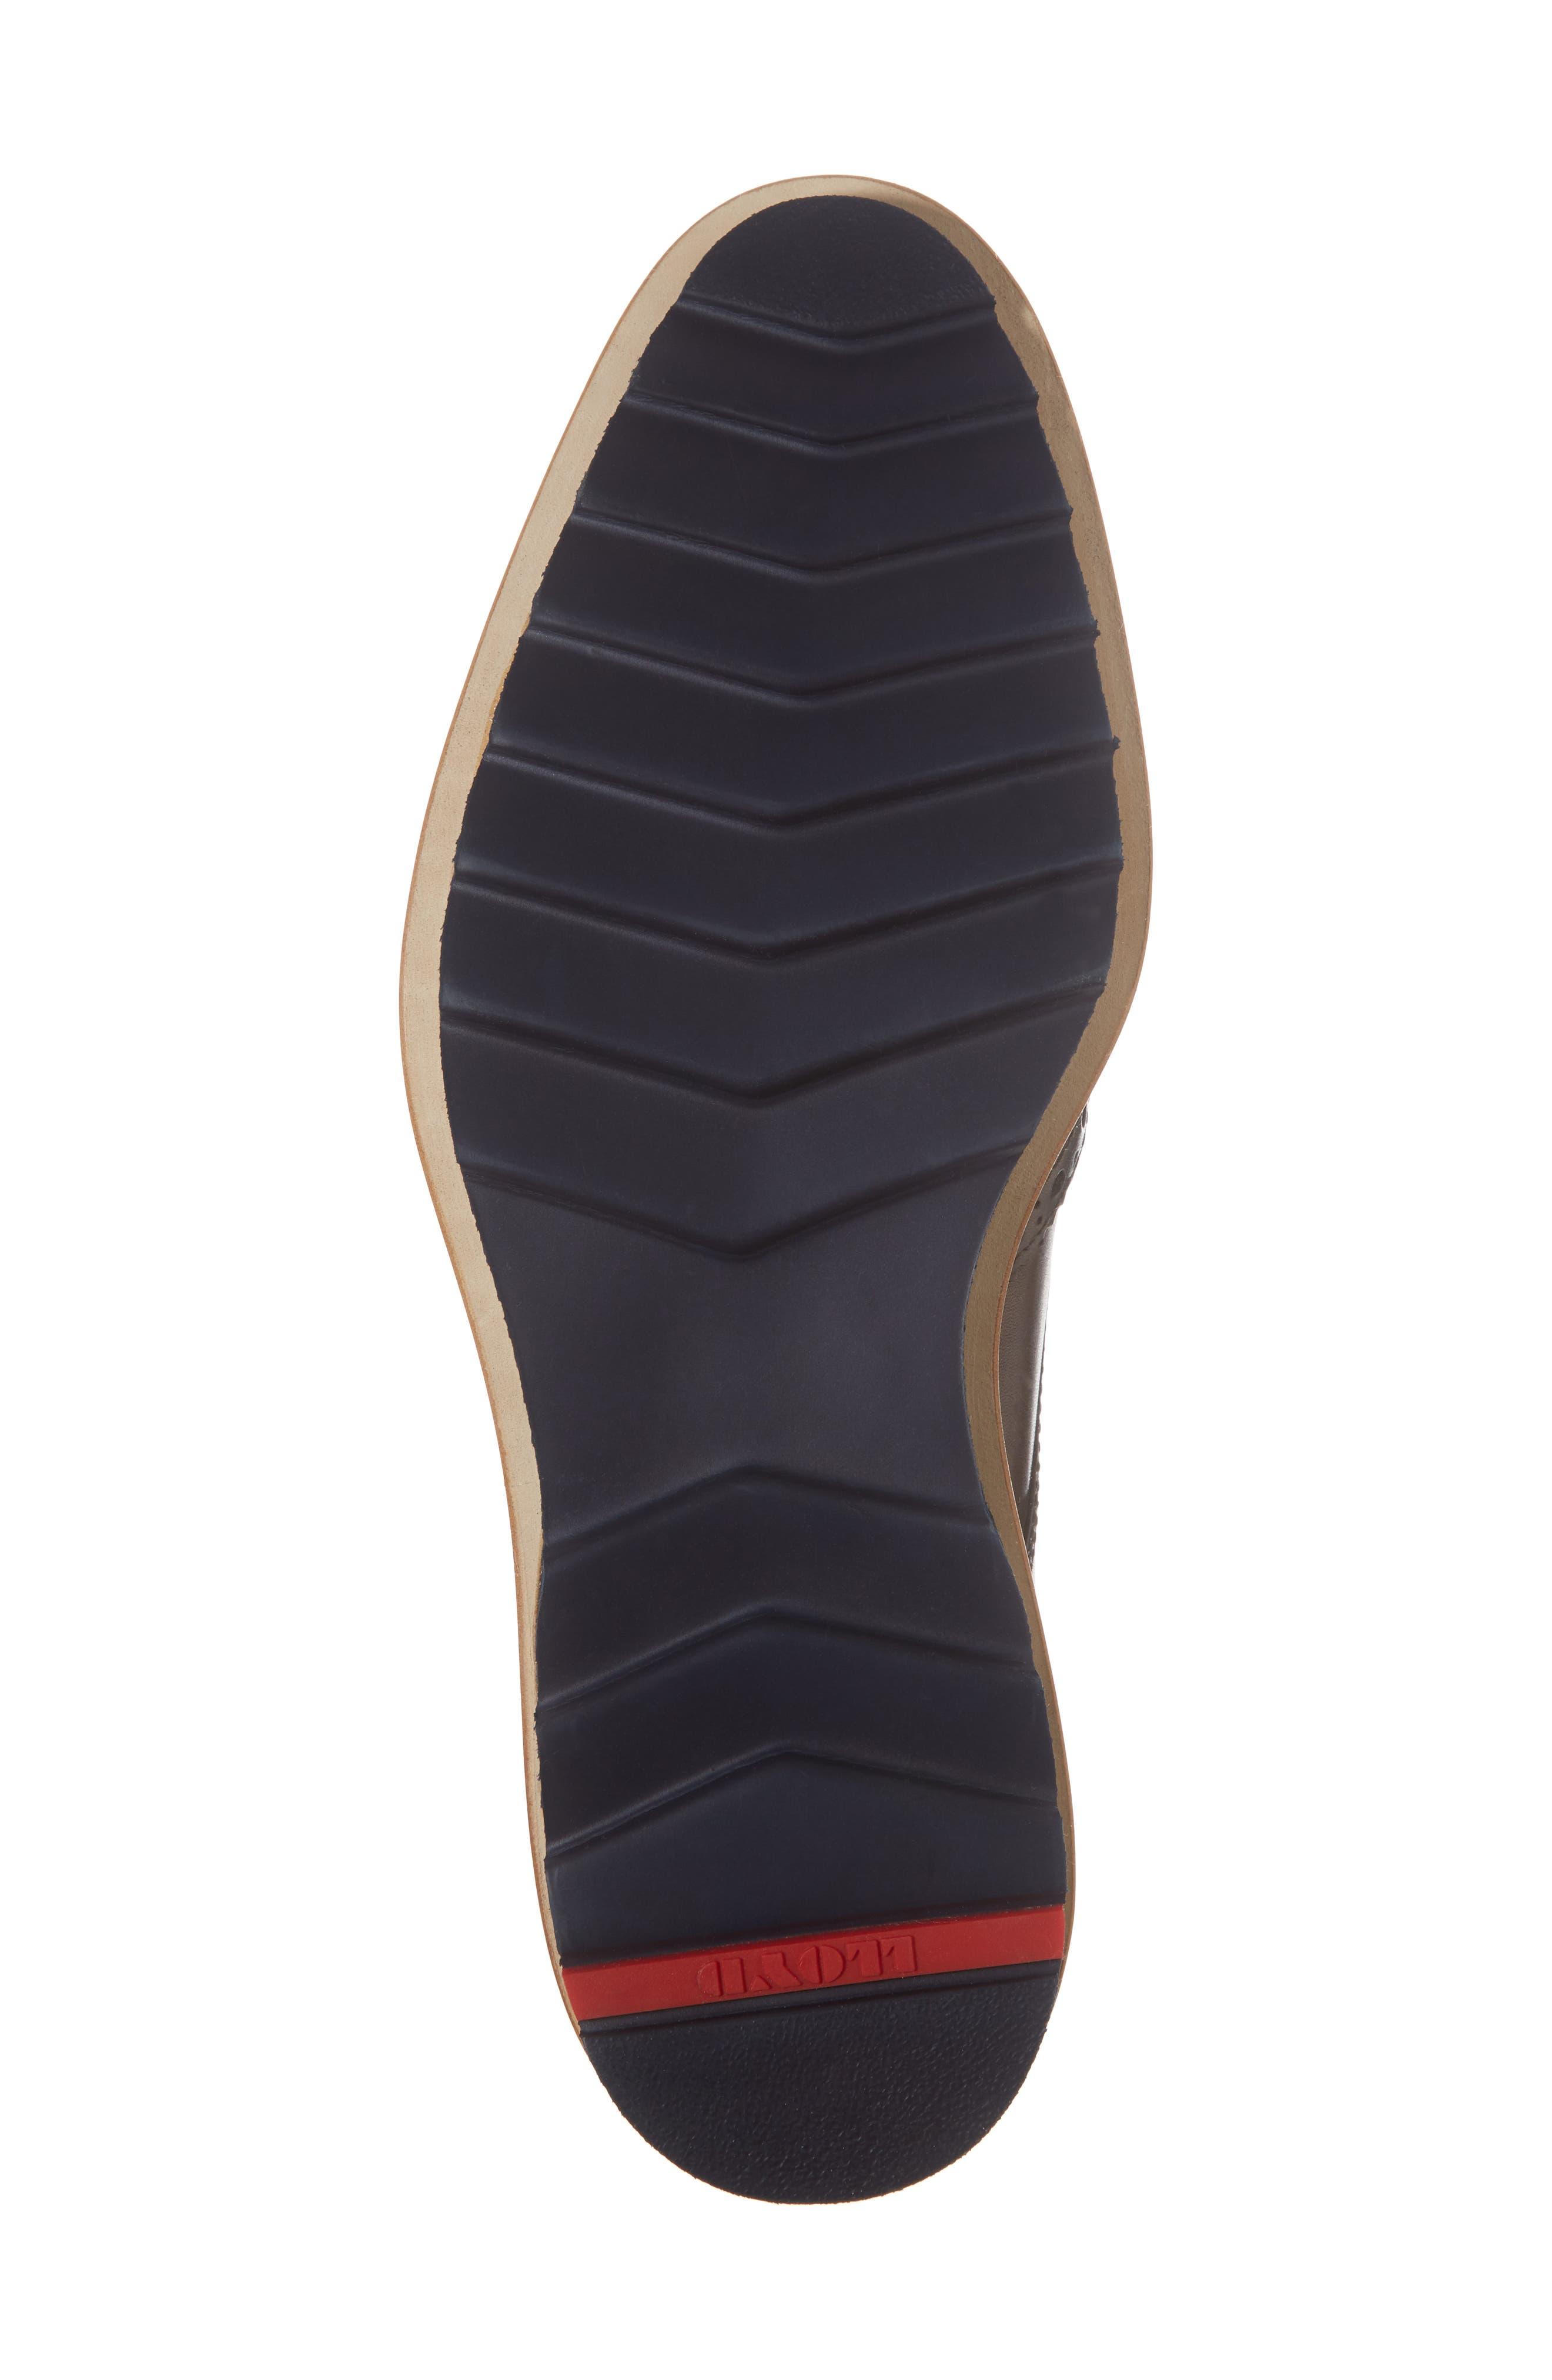 Fairbanks Wingtip,                             Alternate thumbnail 6, color,                             Brown Leather